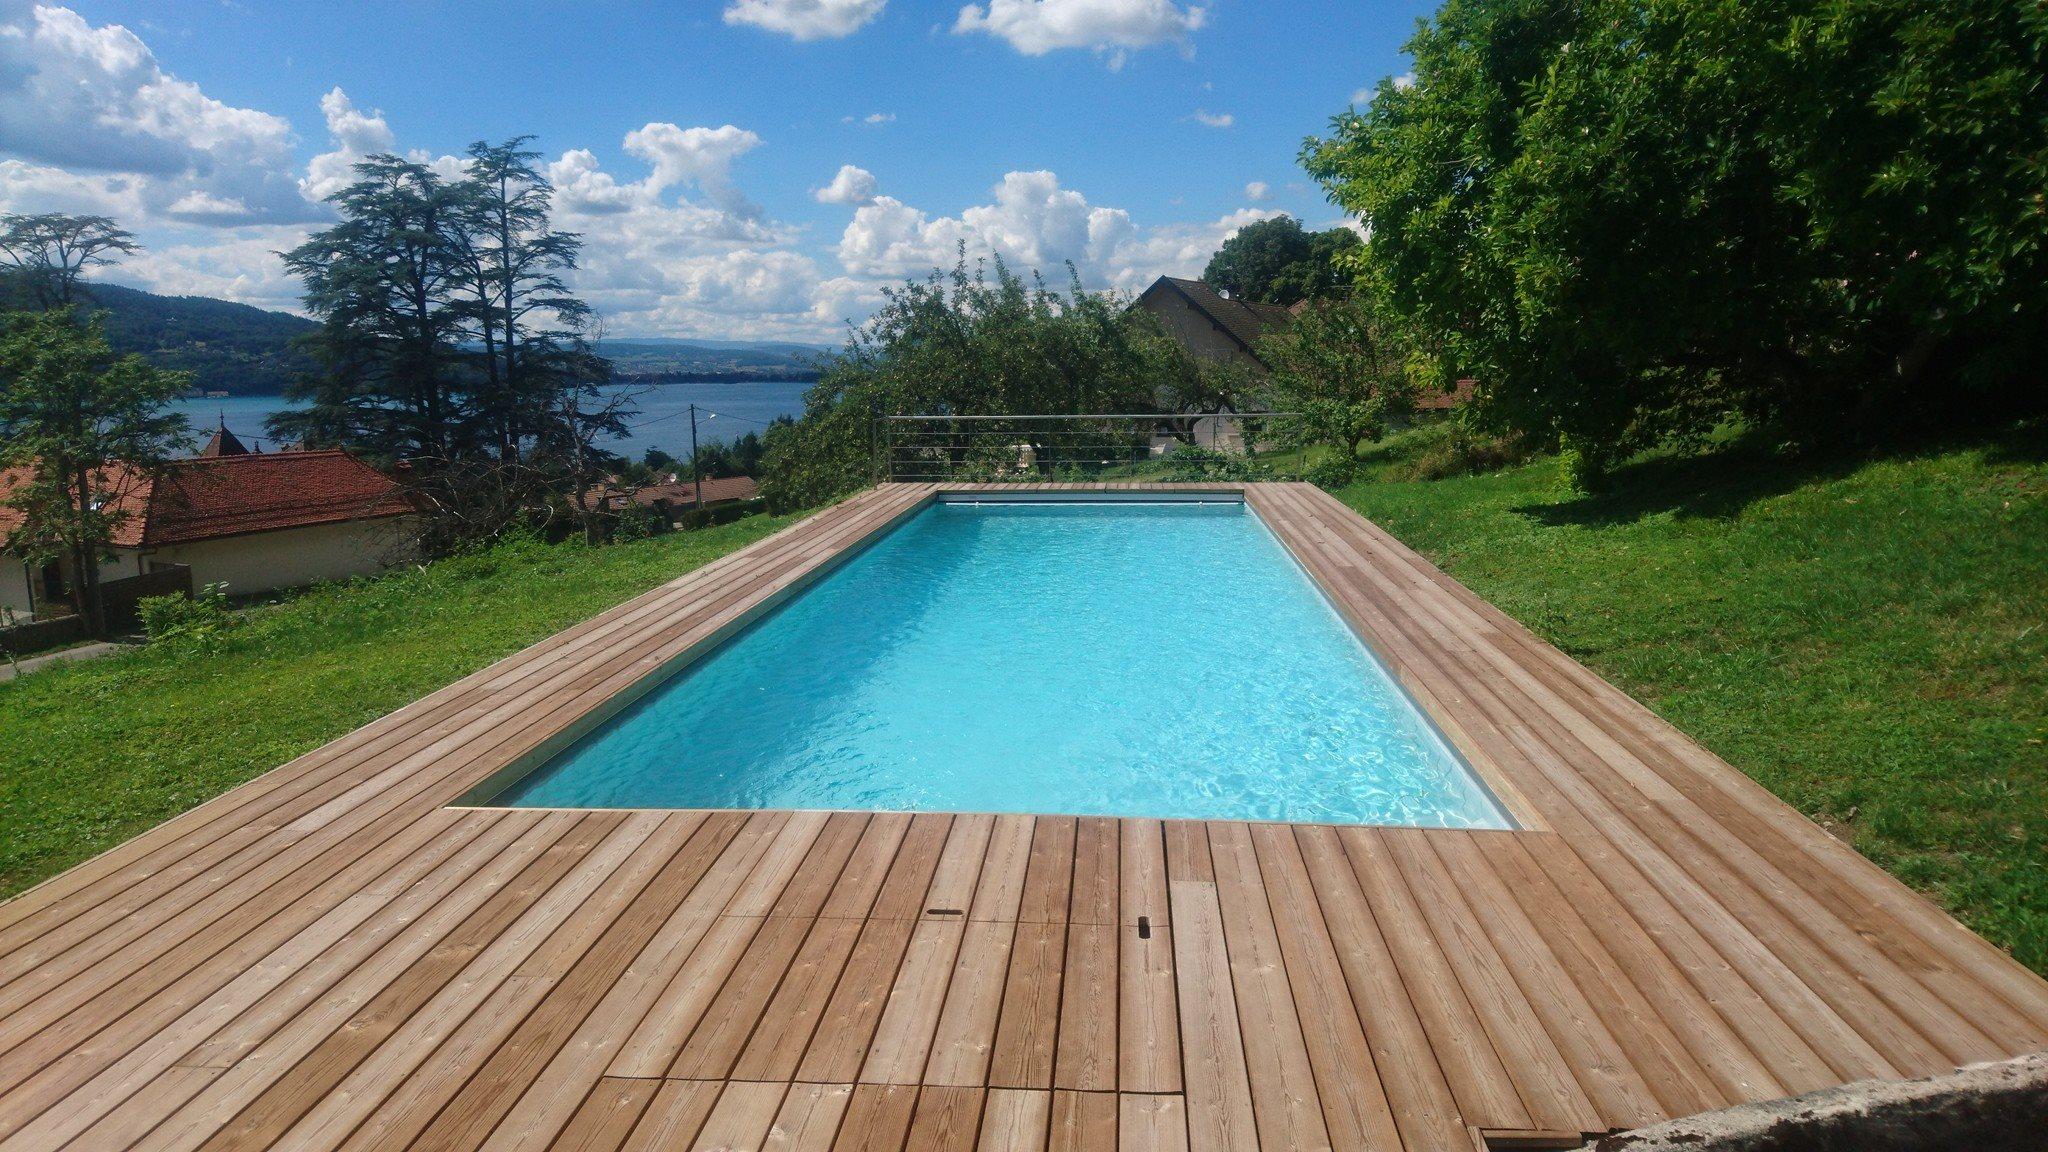 Service hivernage piscine annecy piscines annecy desjoyaux for Flotteur hivernage piscine desjoyaux